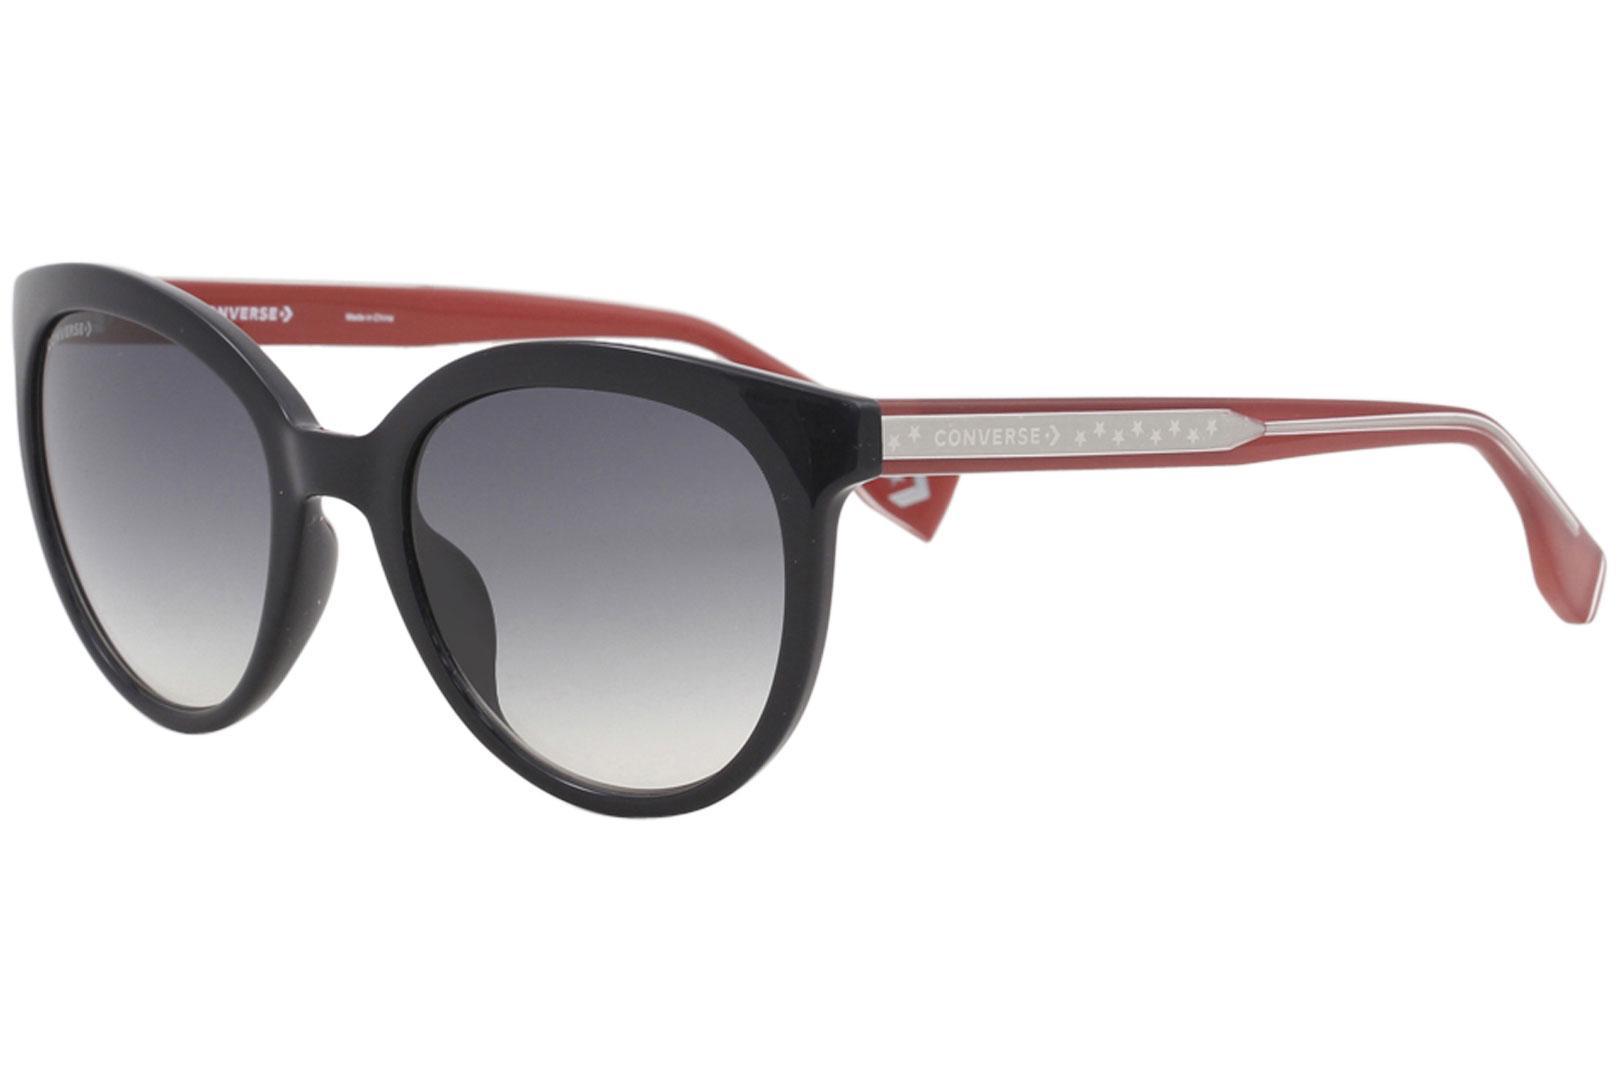 8805ed5bbd1 Converse Women s SCO055 SCO 055 Fashion Oval Sunglasses